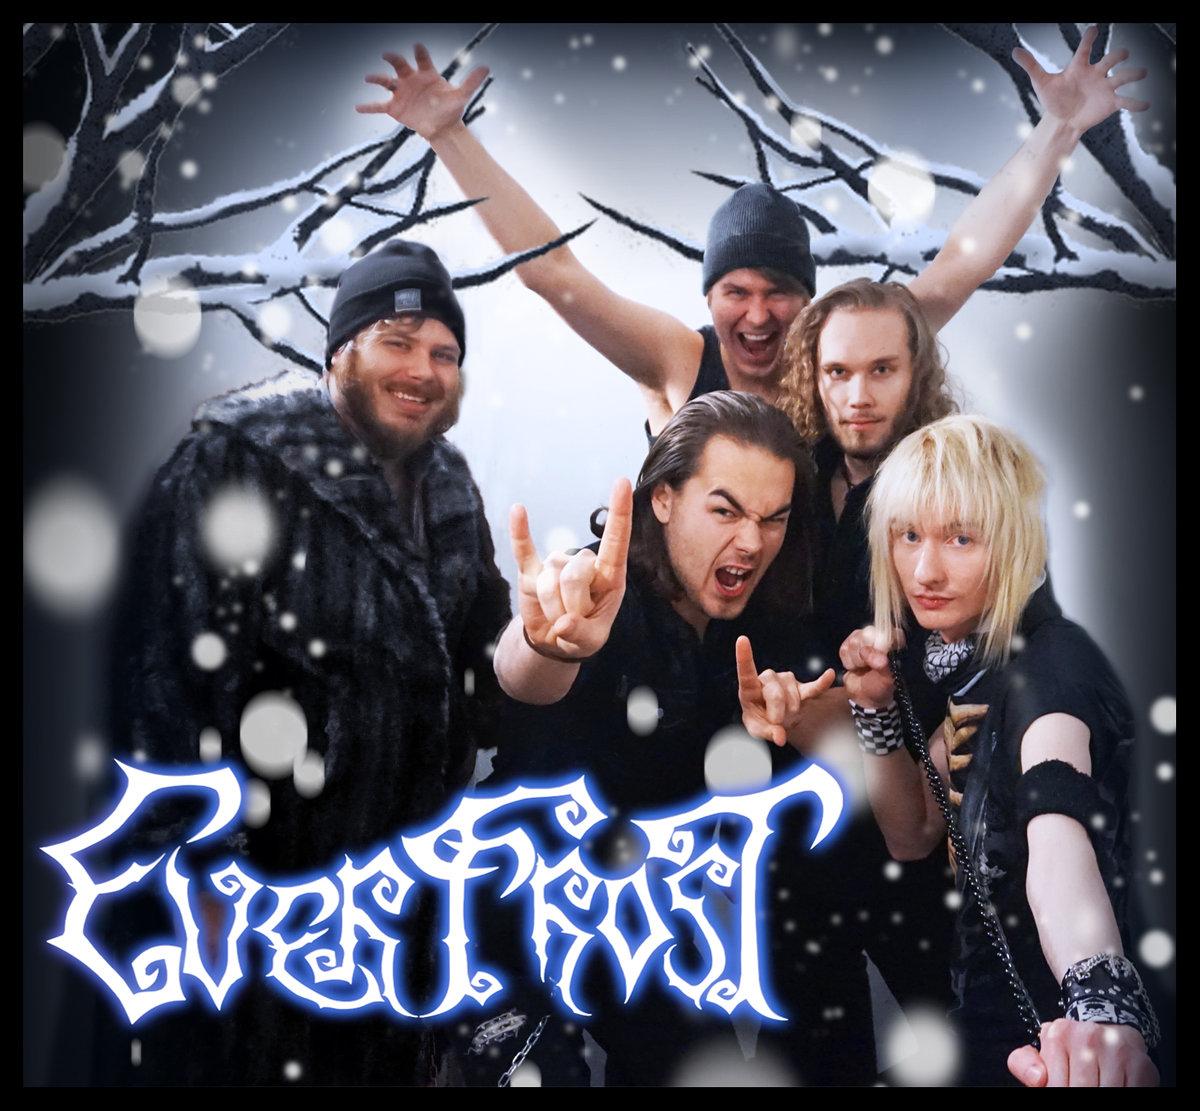 everfrost-pic.jpg